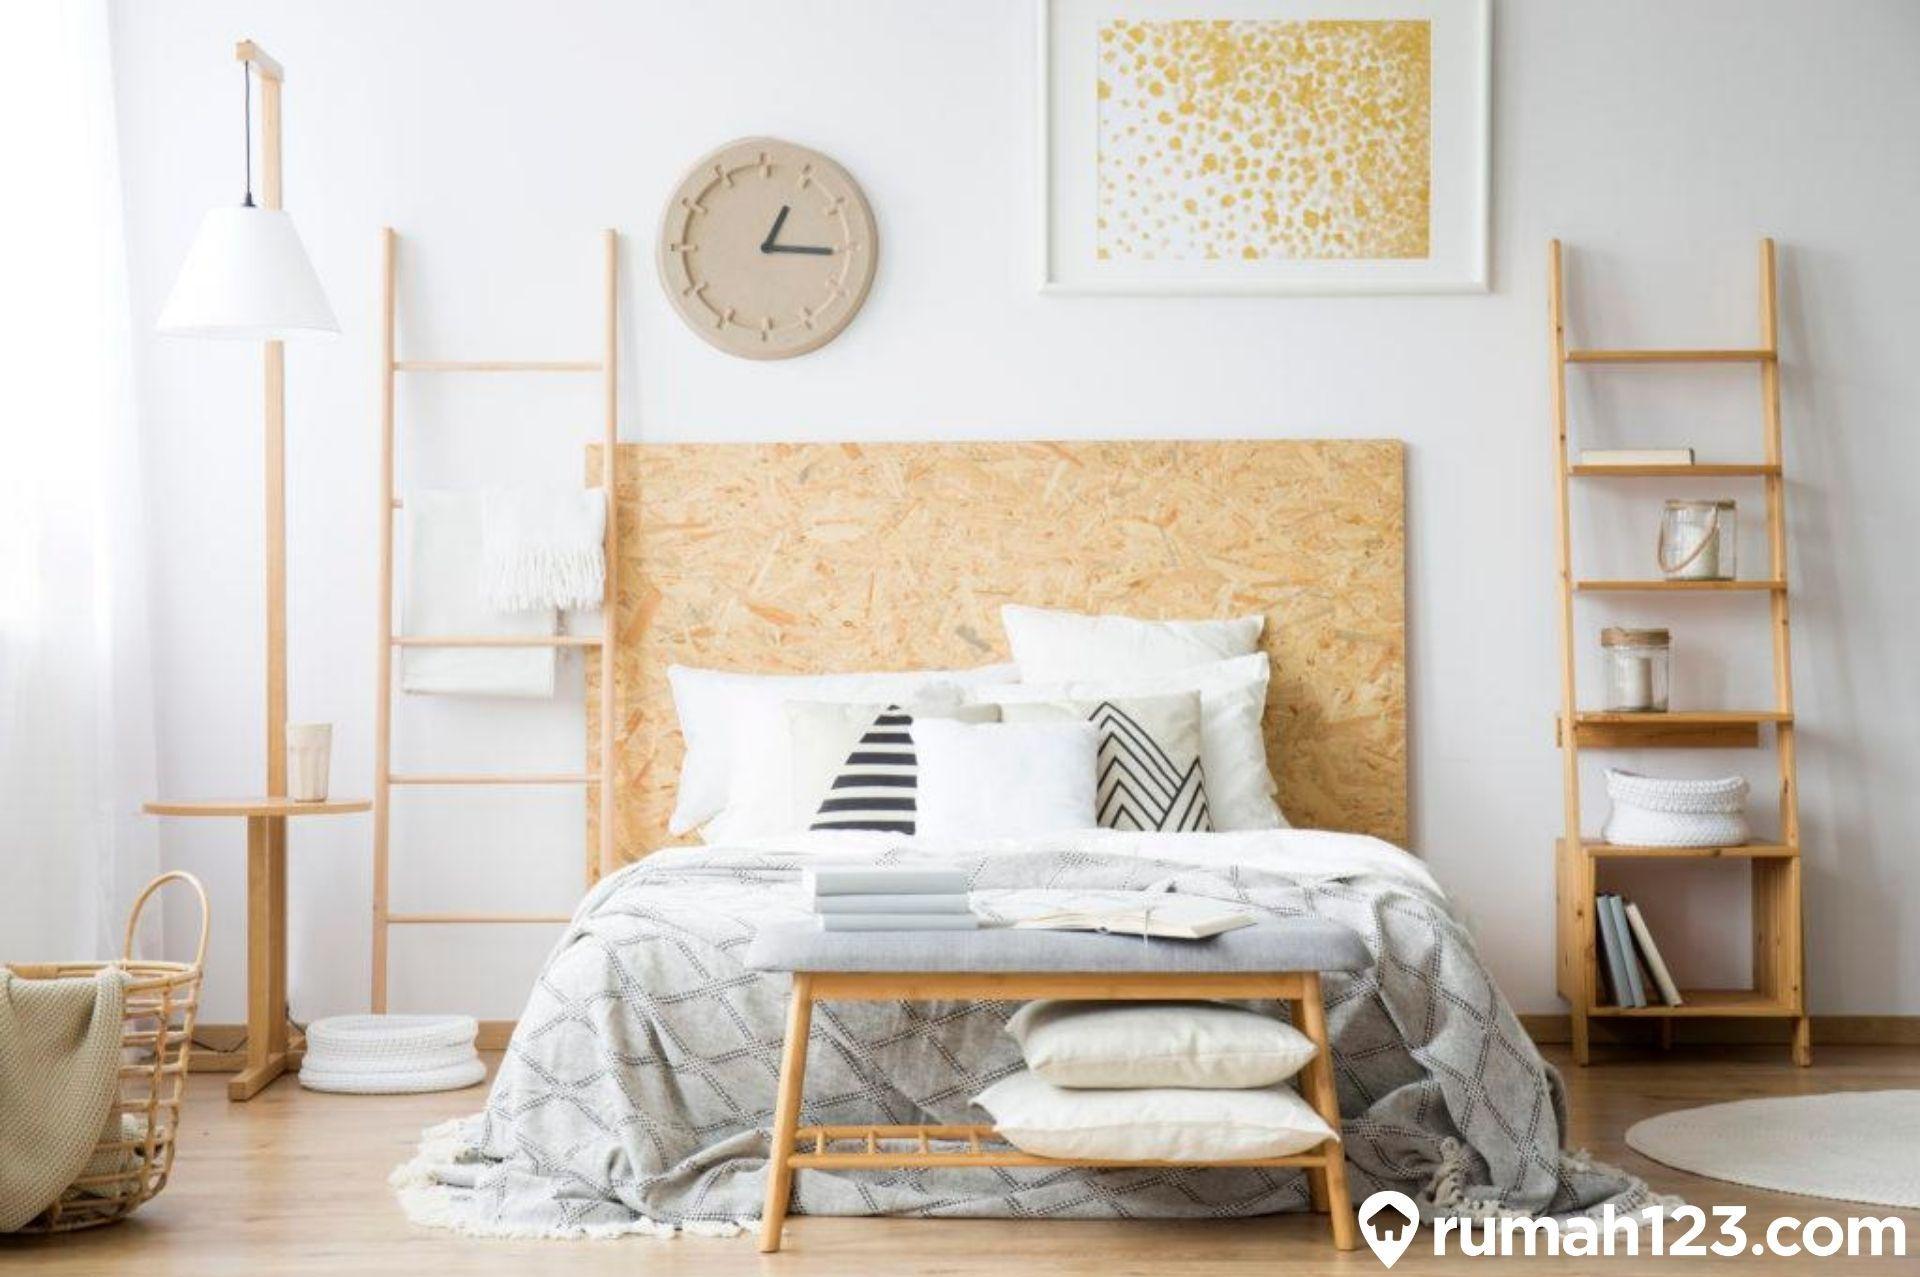 Desain Kamar Kost Jadul Jadi Minimalis Estetis Cuma Modal 10 Barang Ini Harga Murah Meriah Rumah123 Com